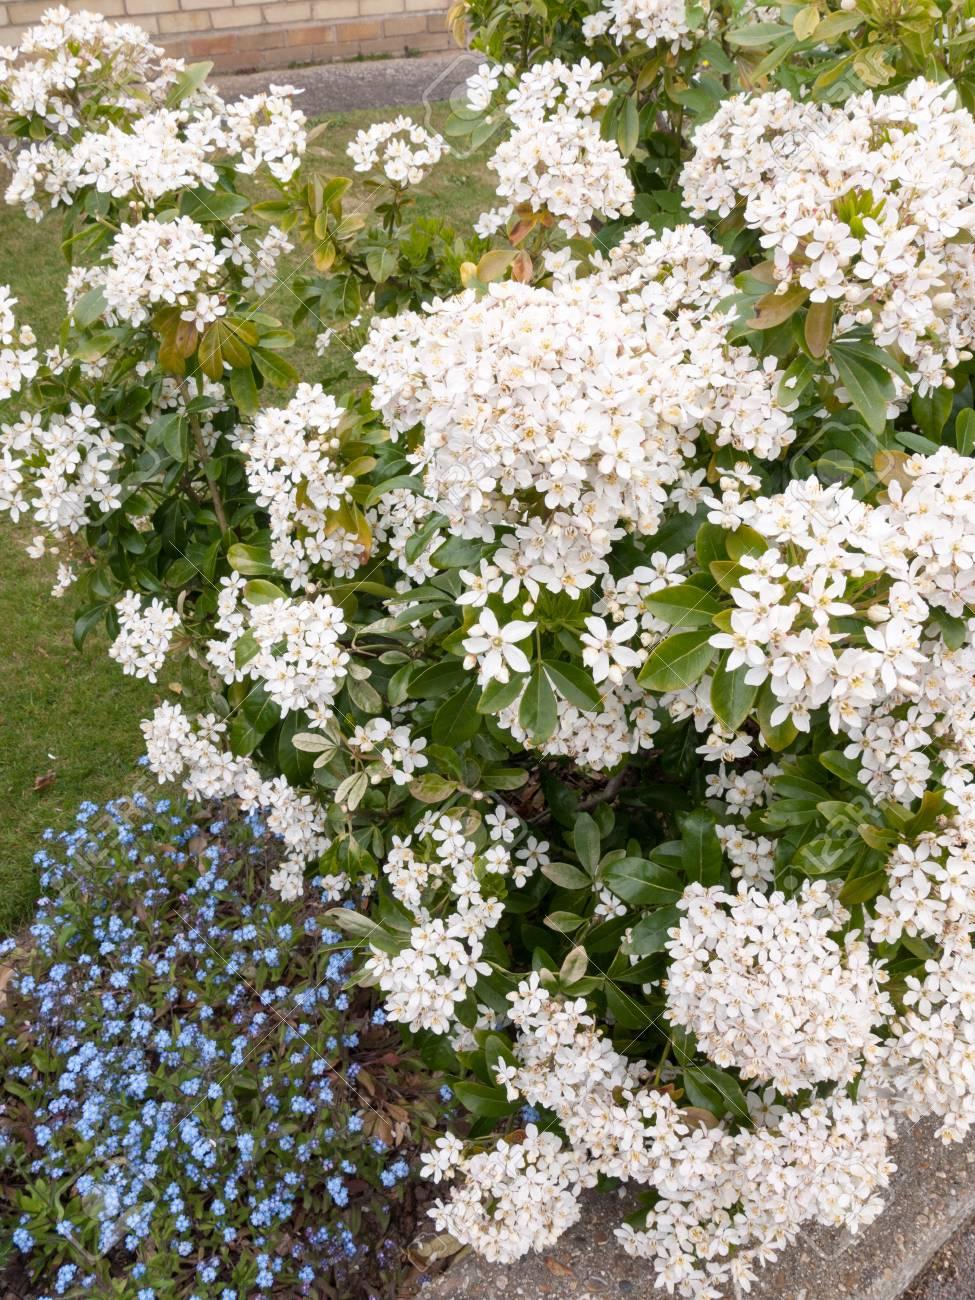 Beautiful bush of bunches of white flower heads in spring light beautiful bush of bunches of white flower heads in spring light with some small blue flower mightylinksfo